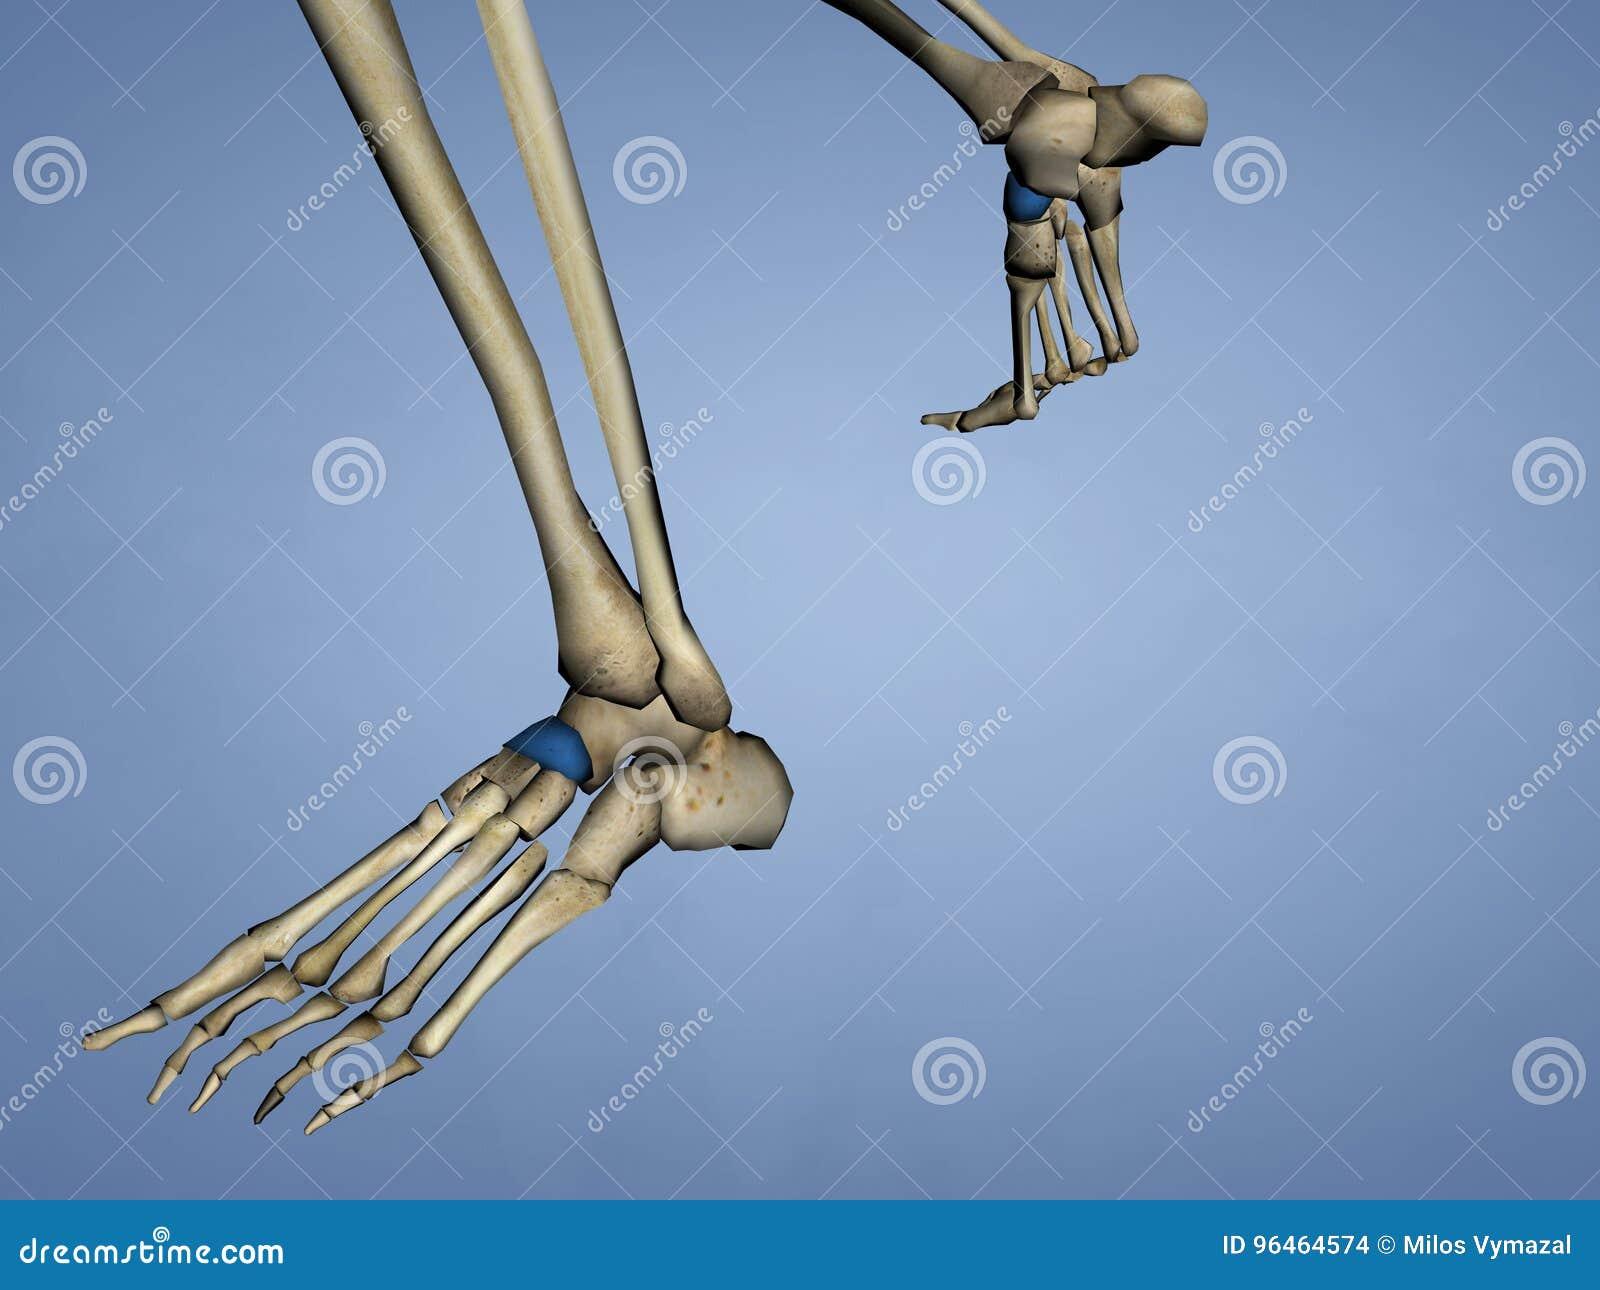 Os naviculare, Modell 3D stock abbildung. Illustration von anatomie ...